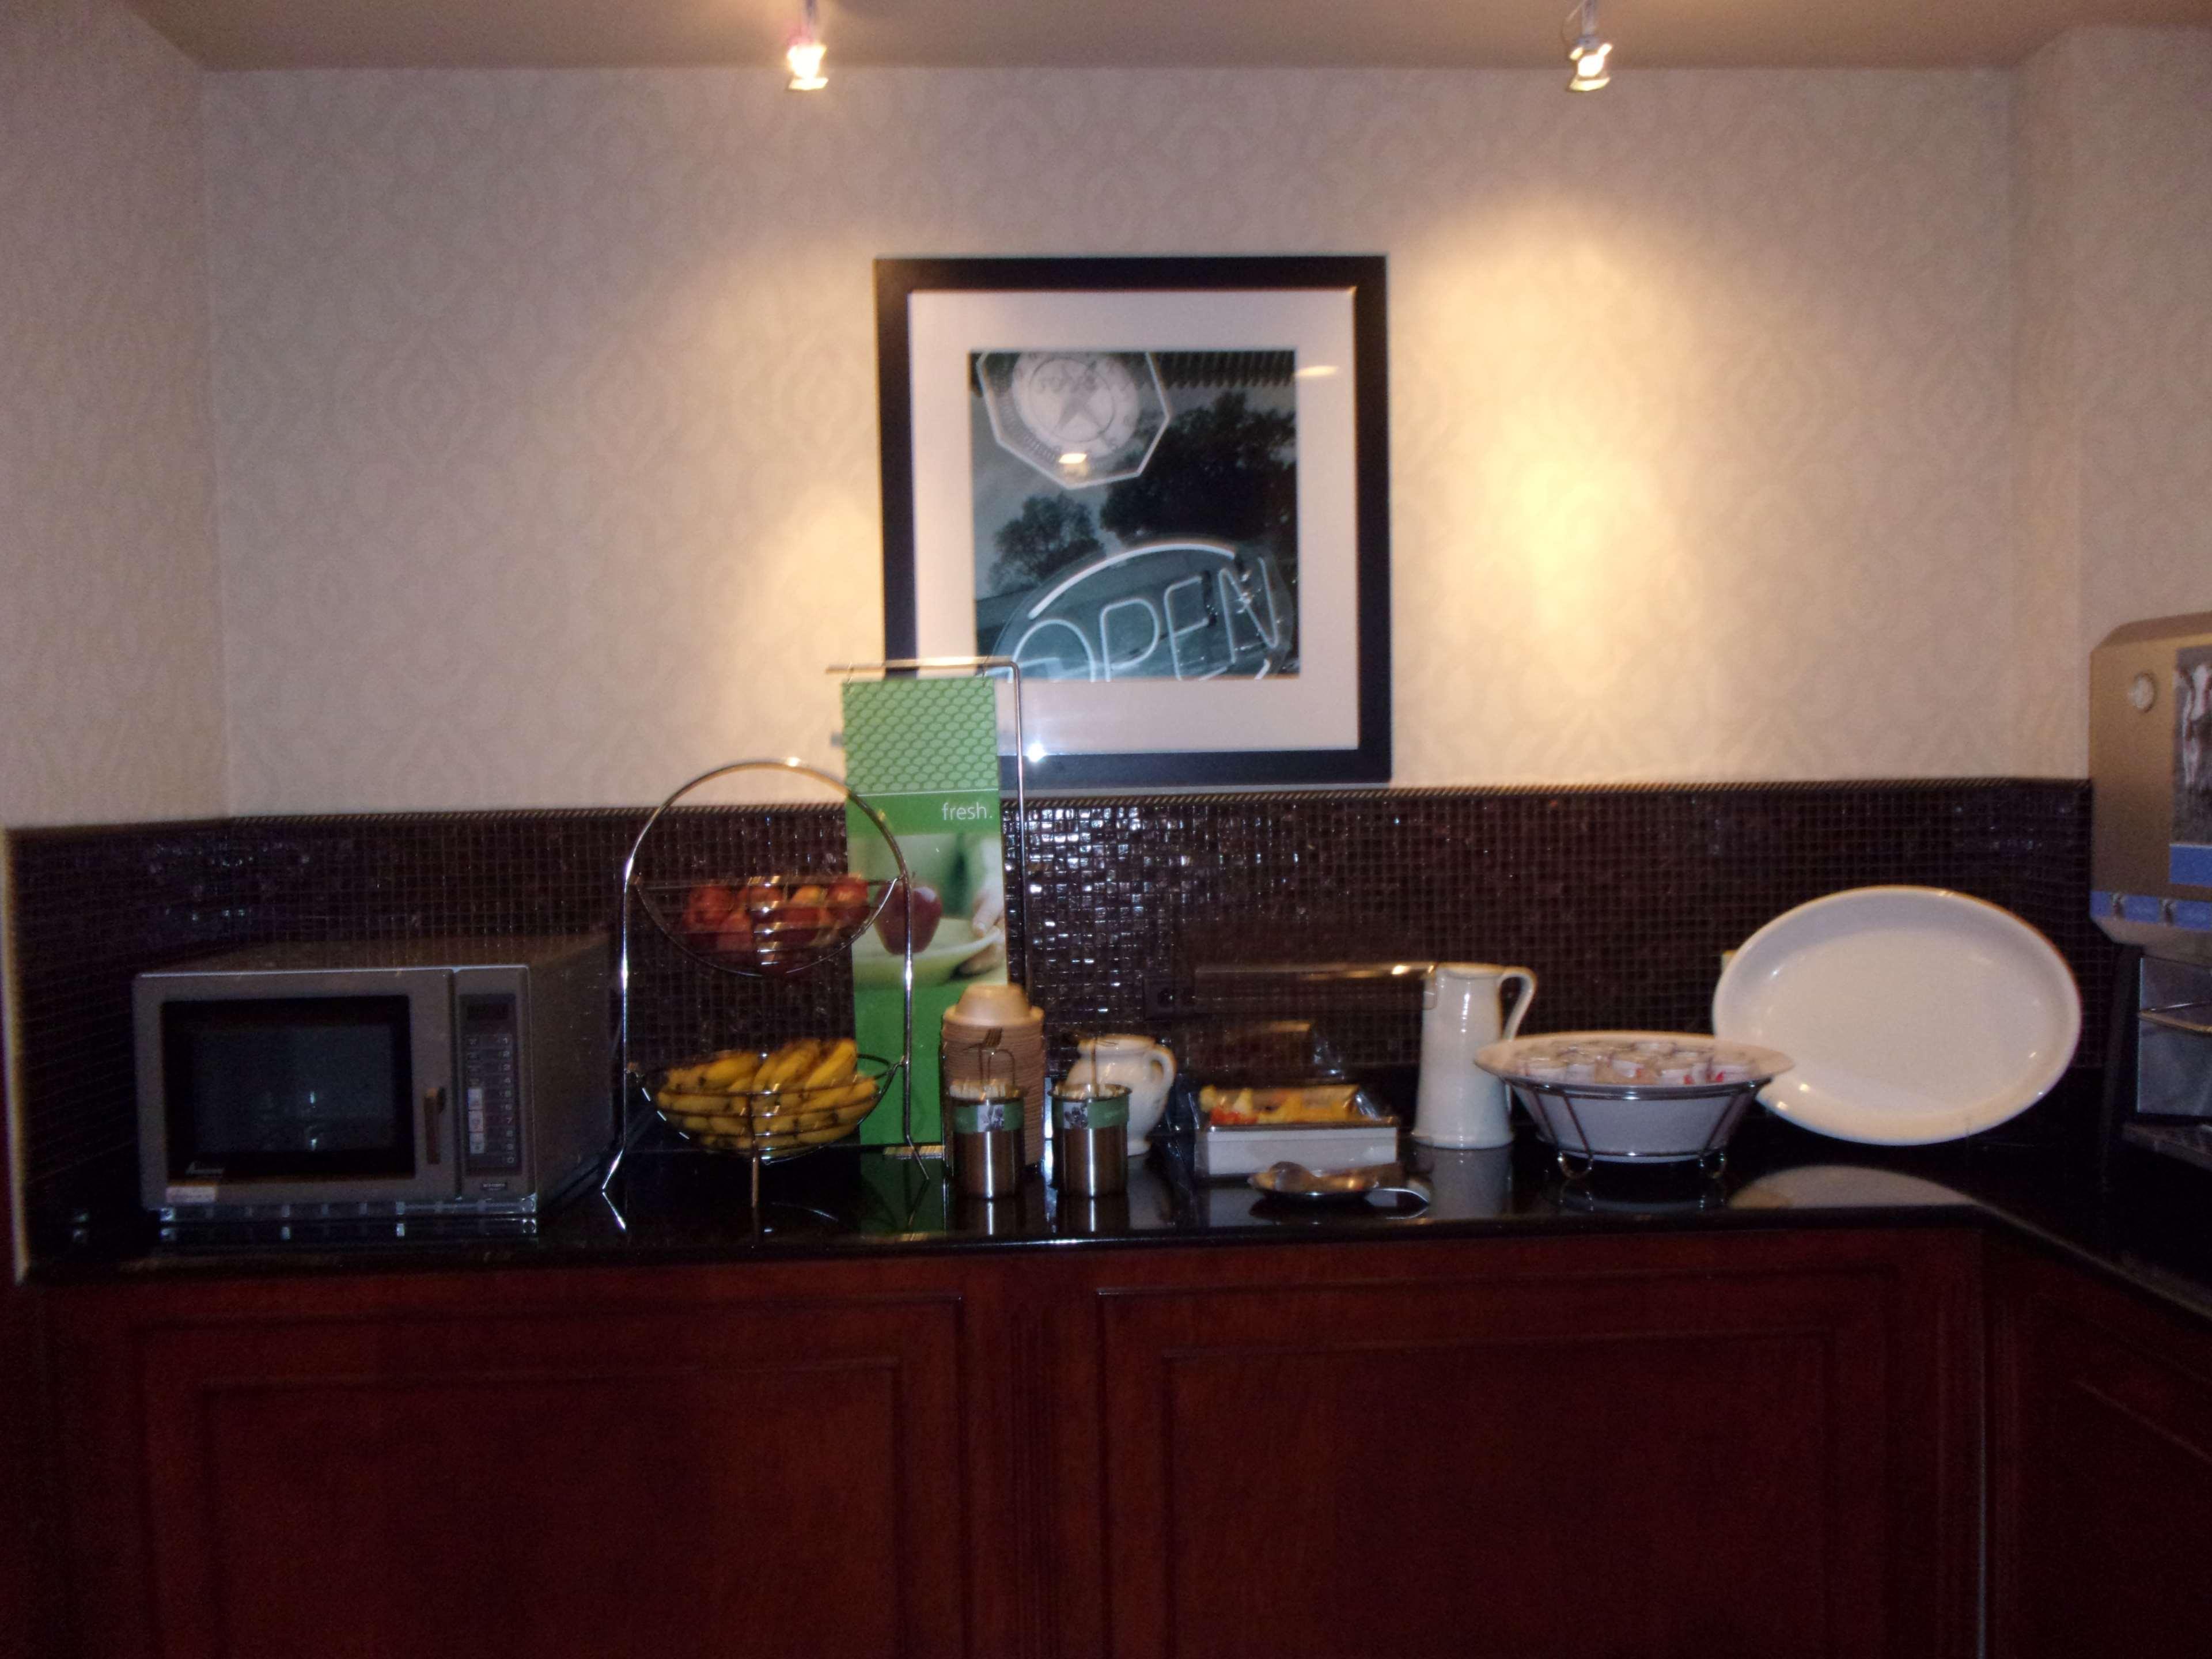 Hampton Inn & Suites Bolingbrook image 18